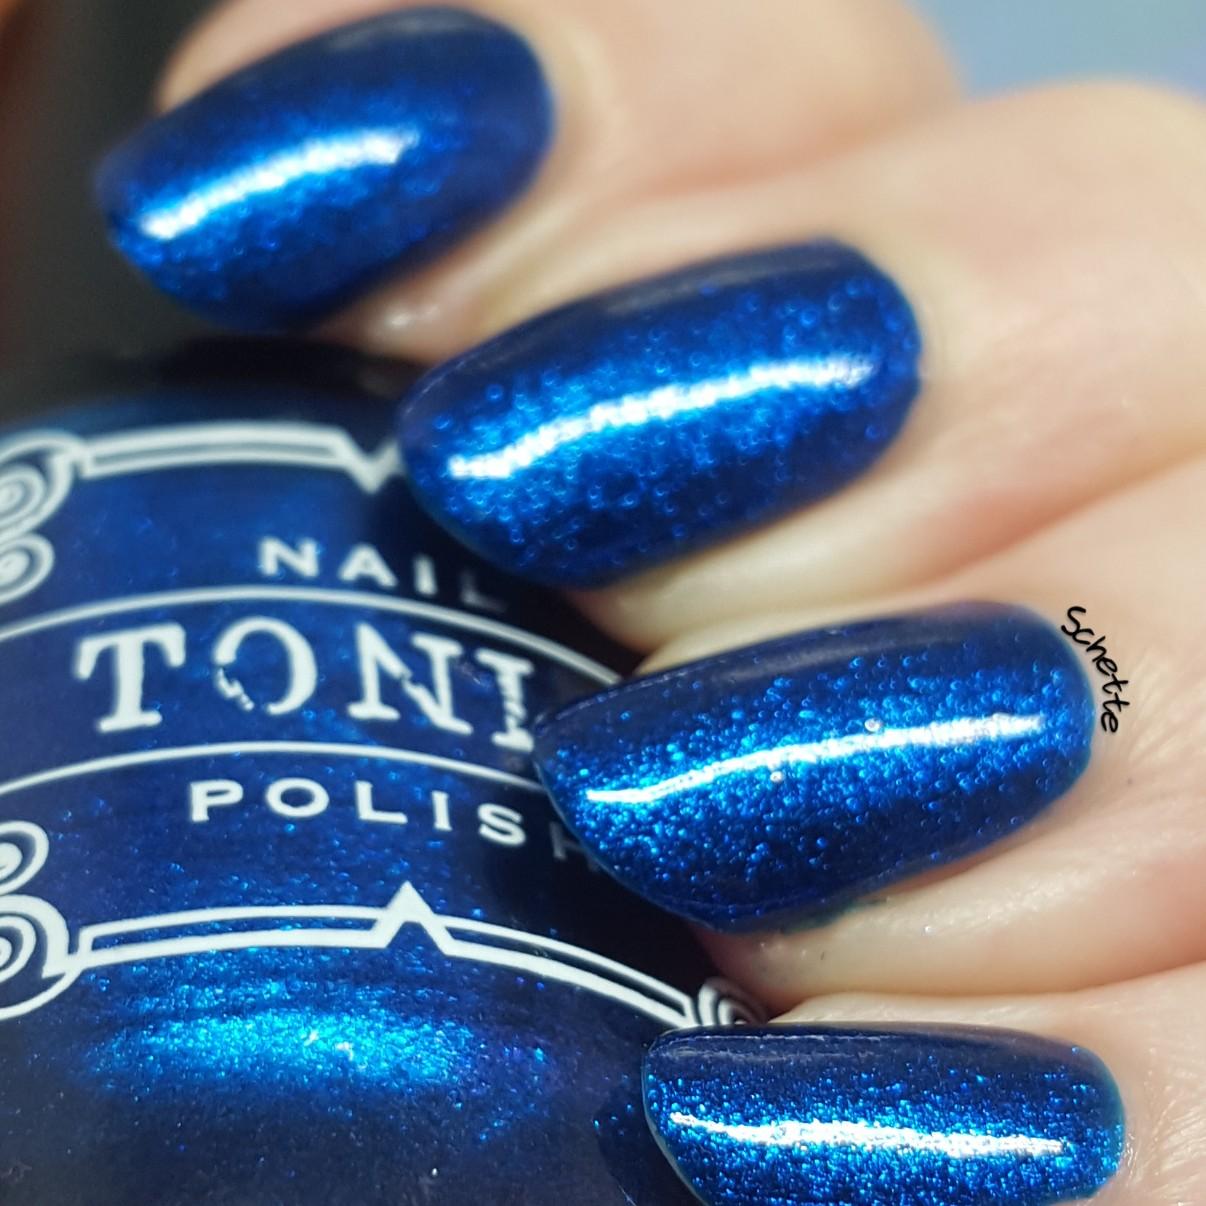 Tonic Polish - Cookie Monster